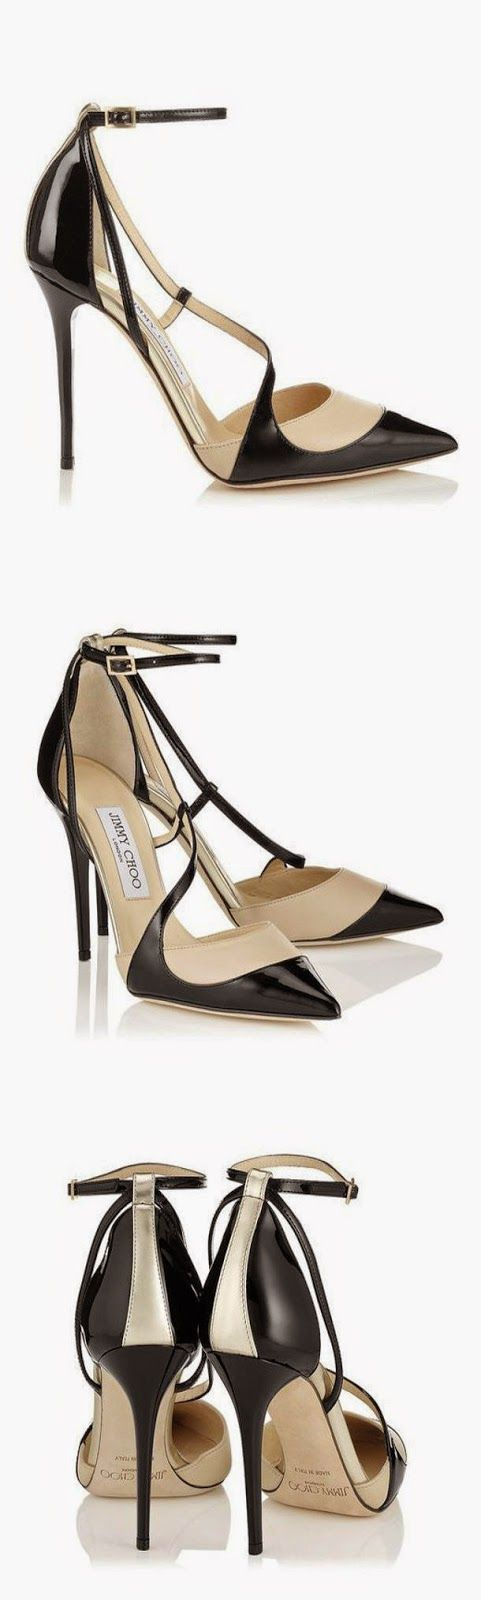 Jimmy Choo MUTYA Cruise Collection 2015 #shoes #beautyinthebag #omg